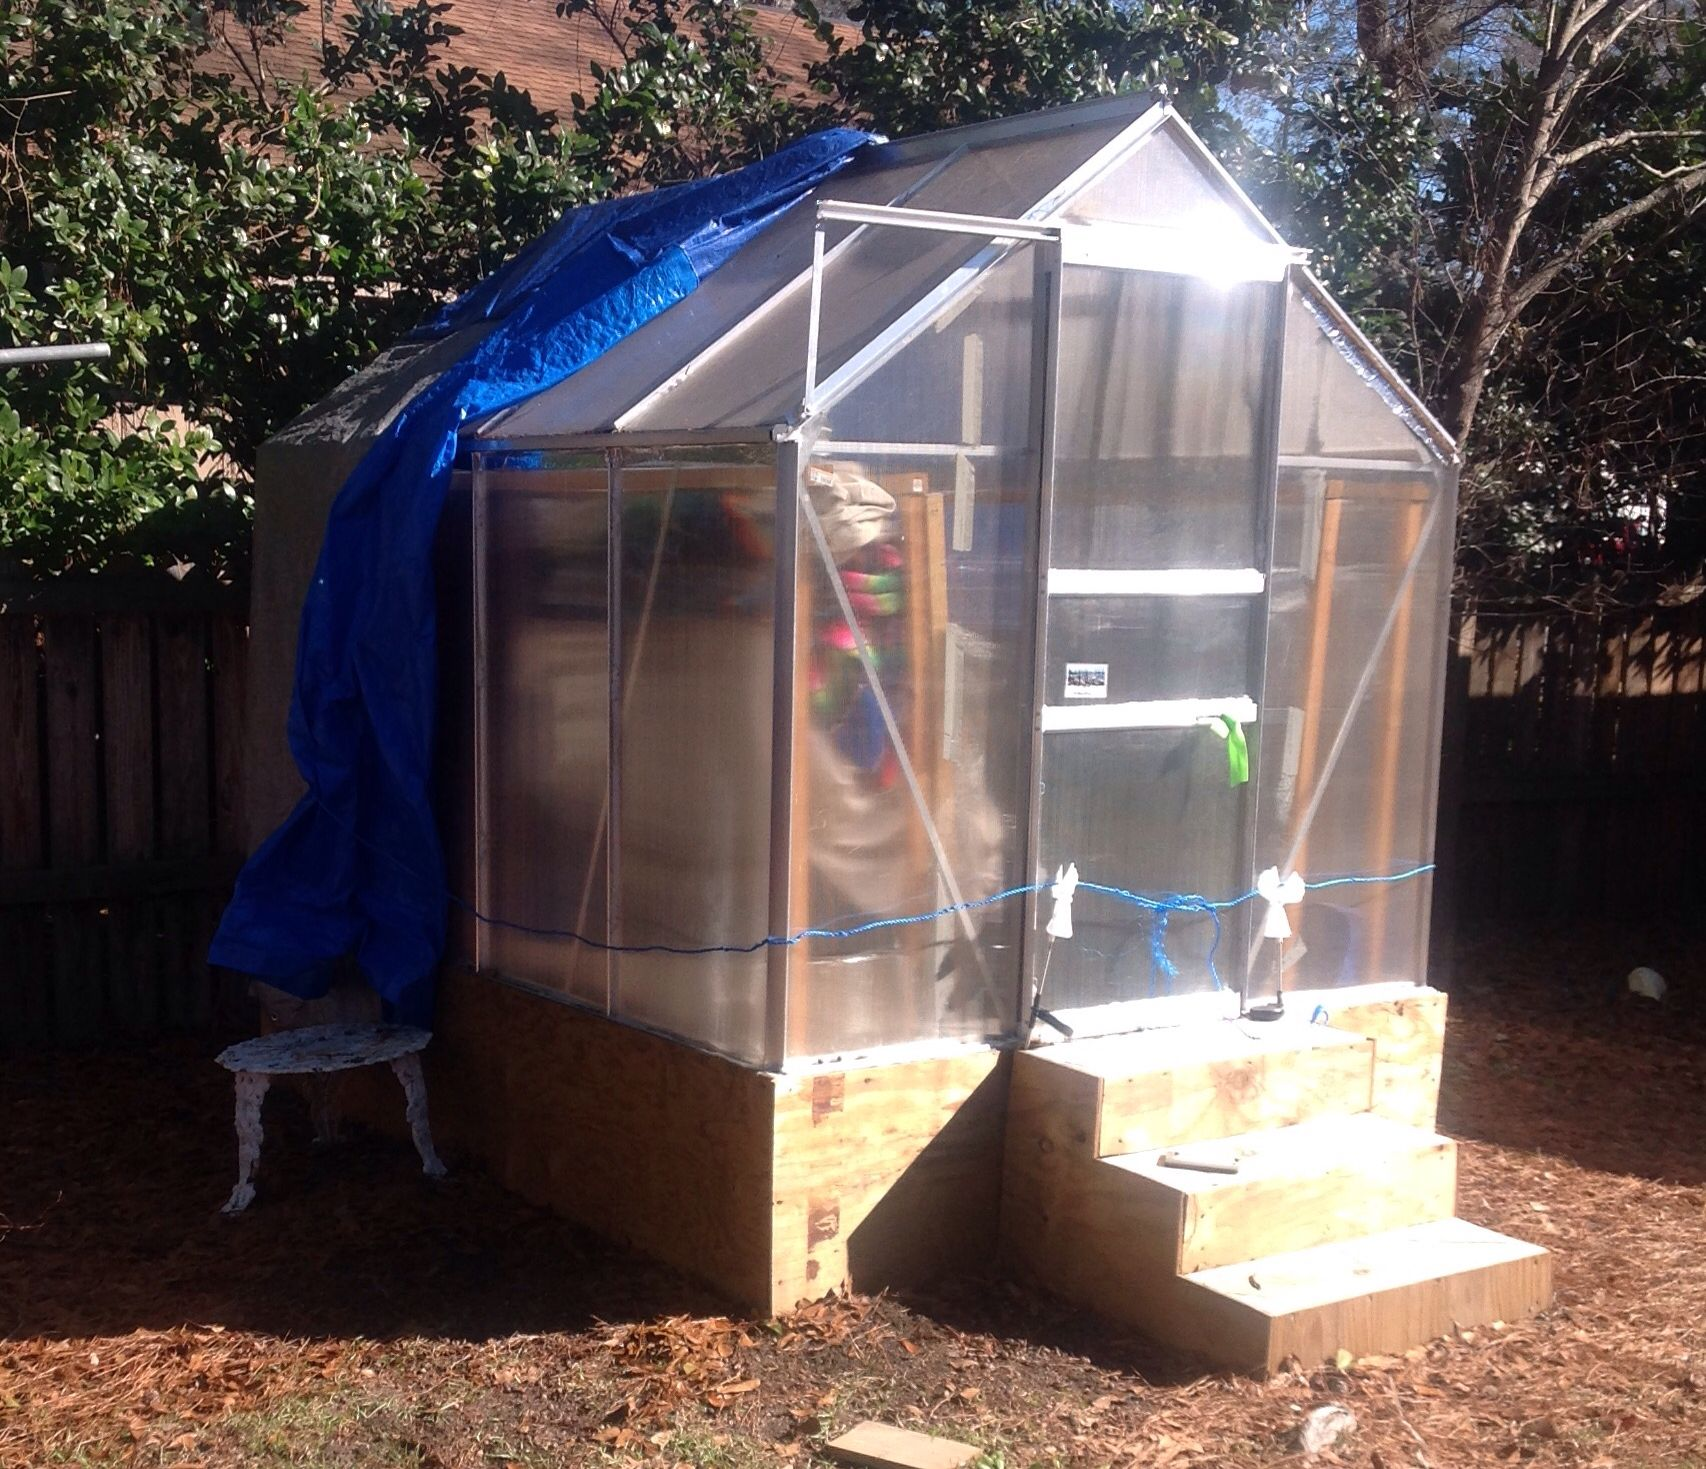 Advanced Solar Powered Greenhouse Ventilation Wiring For Greenhouse Fan Exhaust Greenhouse Fan With Circula Greenhouse Ventilation Greenhouse Plans Greenhouse